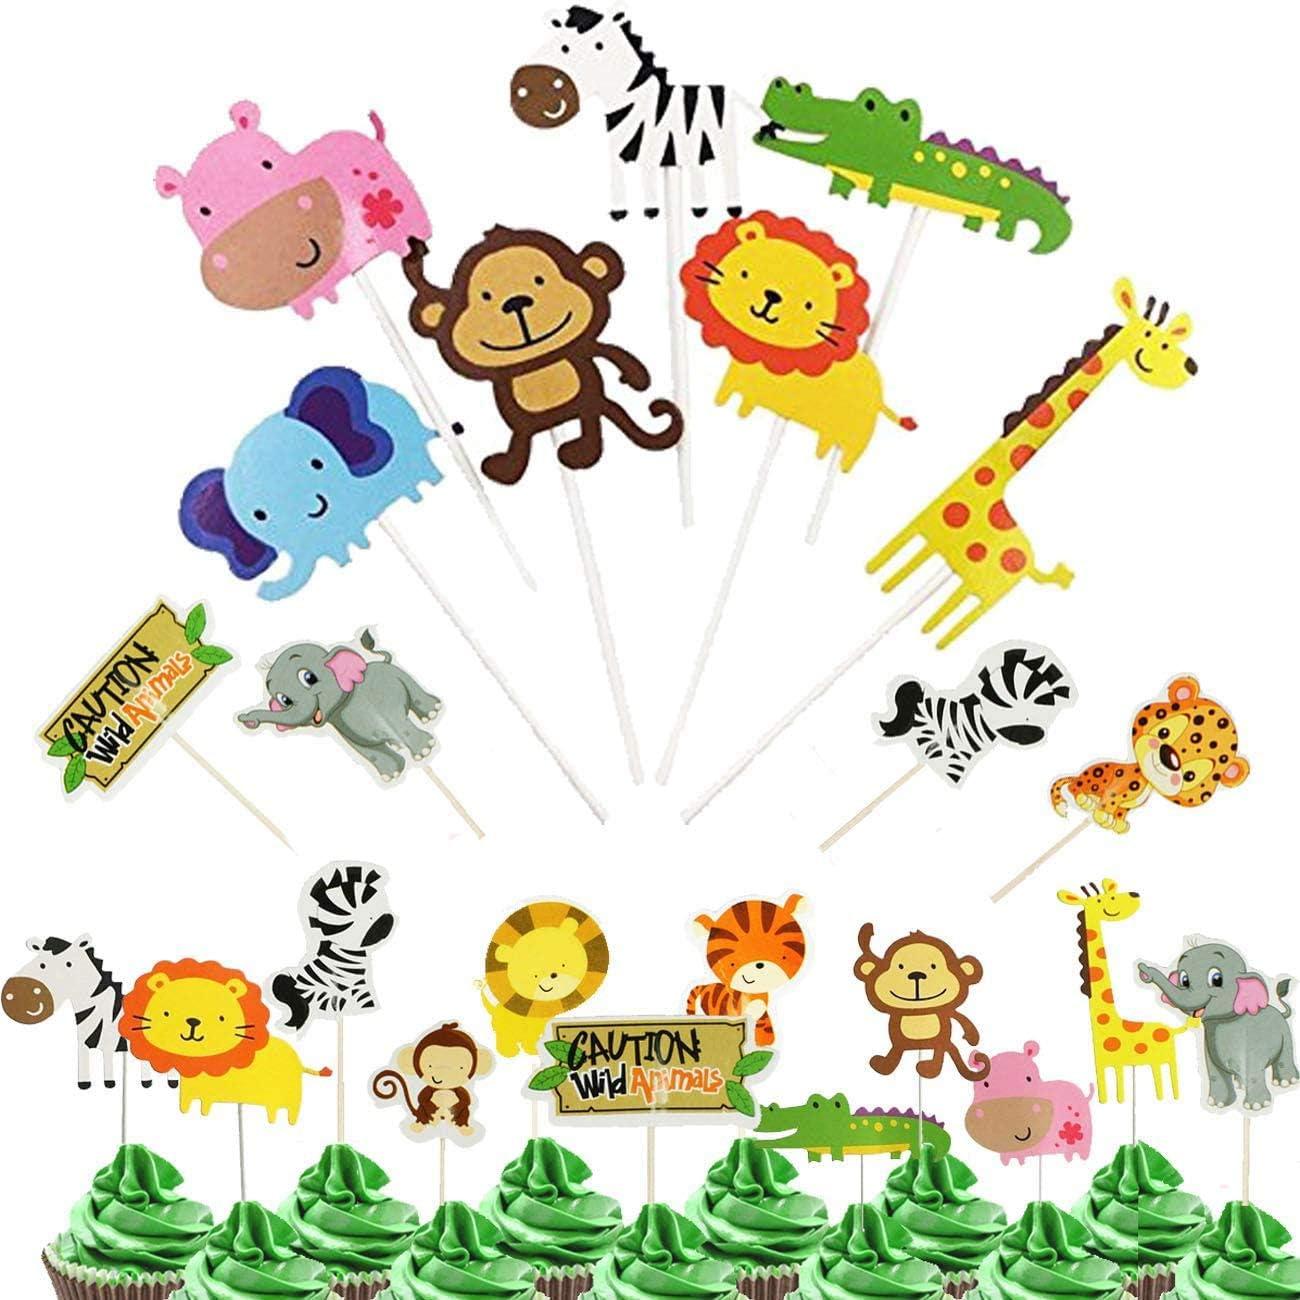 OuMuaMua 38 Jungle Safari Animal Cupcake Toppers Picks - Zoo Animals Cake Decorations Food Picks Animal Theme Party Supplies for Kids Birthday, Baby Shower,Animal Theme Party Decorations